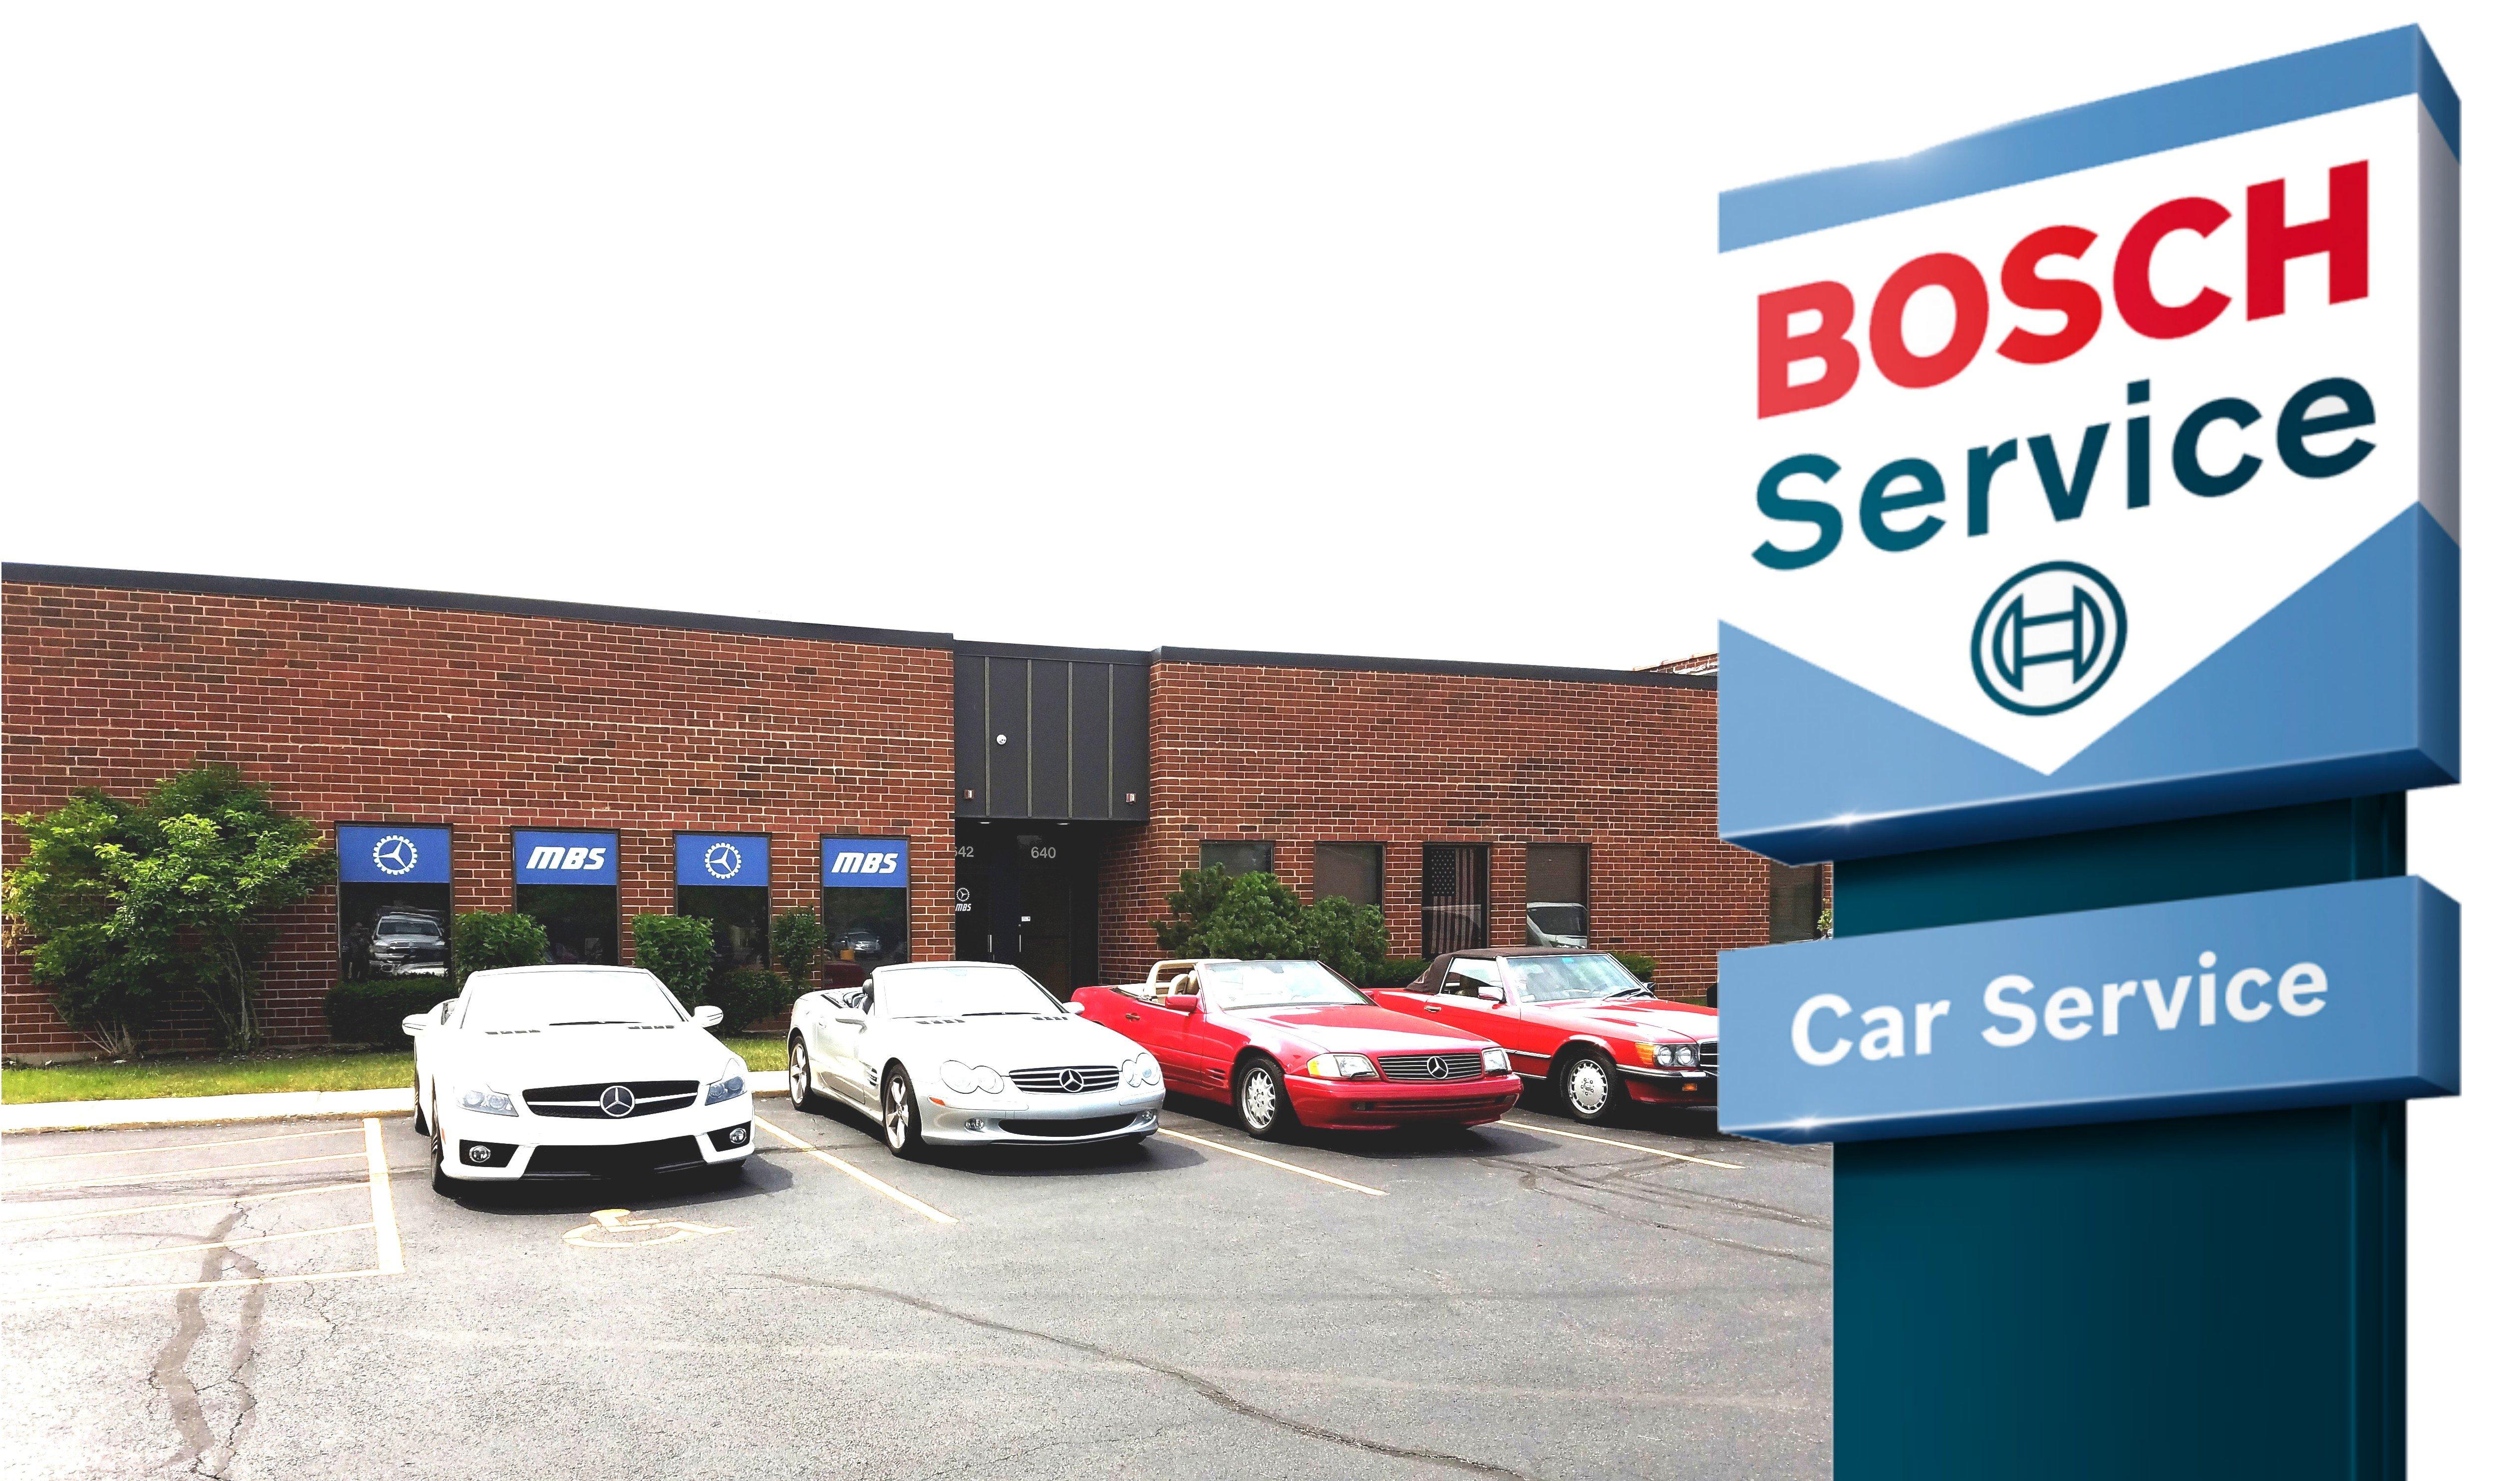 MBS Automotive - Mecedes Benz Specialists - Bosch Auto Service